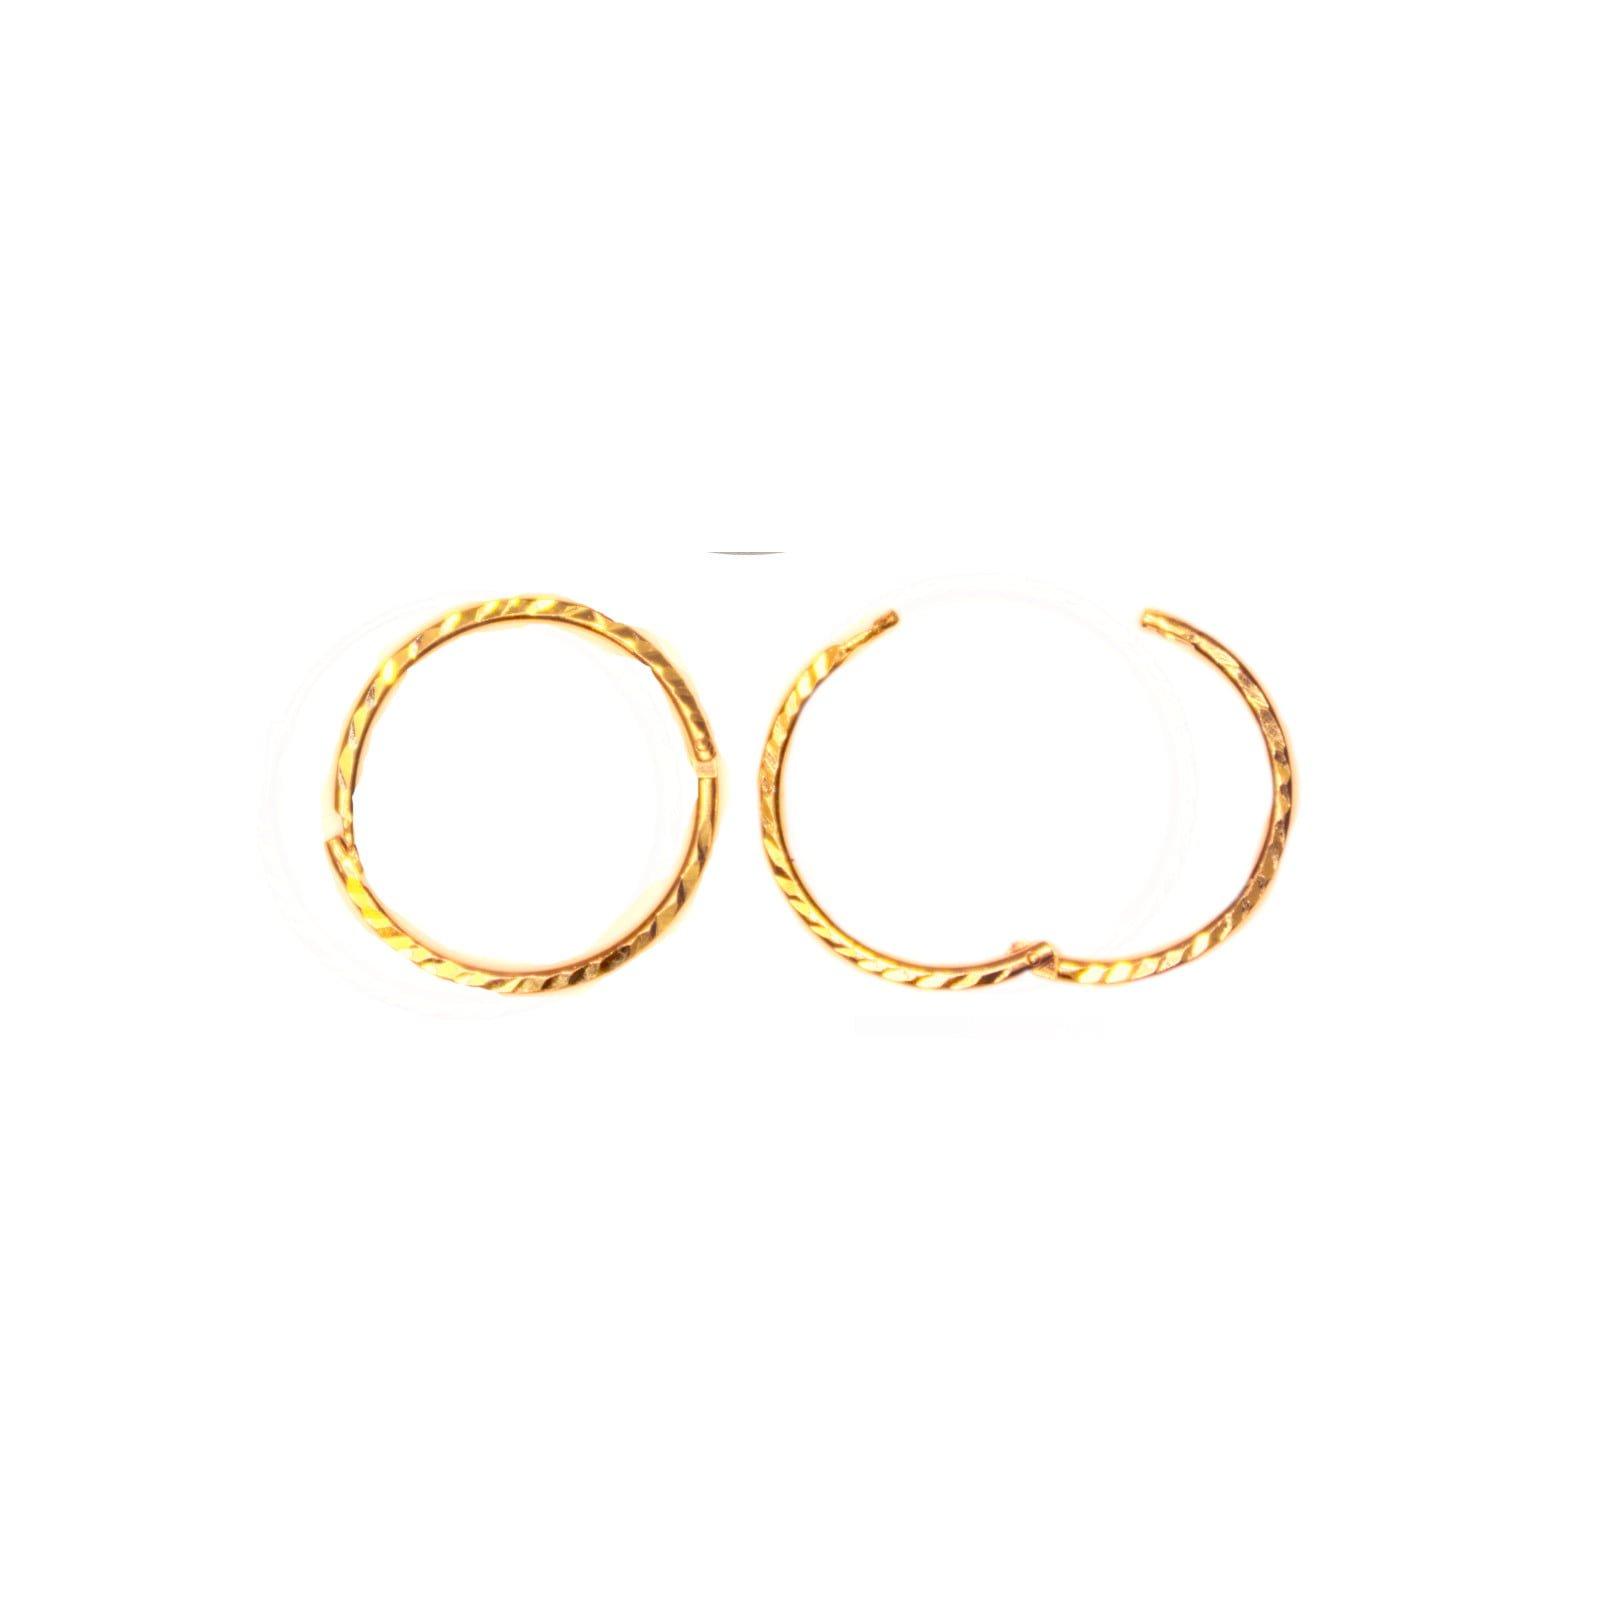 Pair of hinged 14mm 9ct gold hoop earrings. Diamond cut finish.